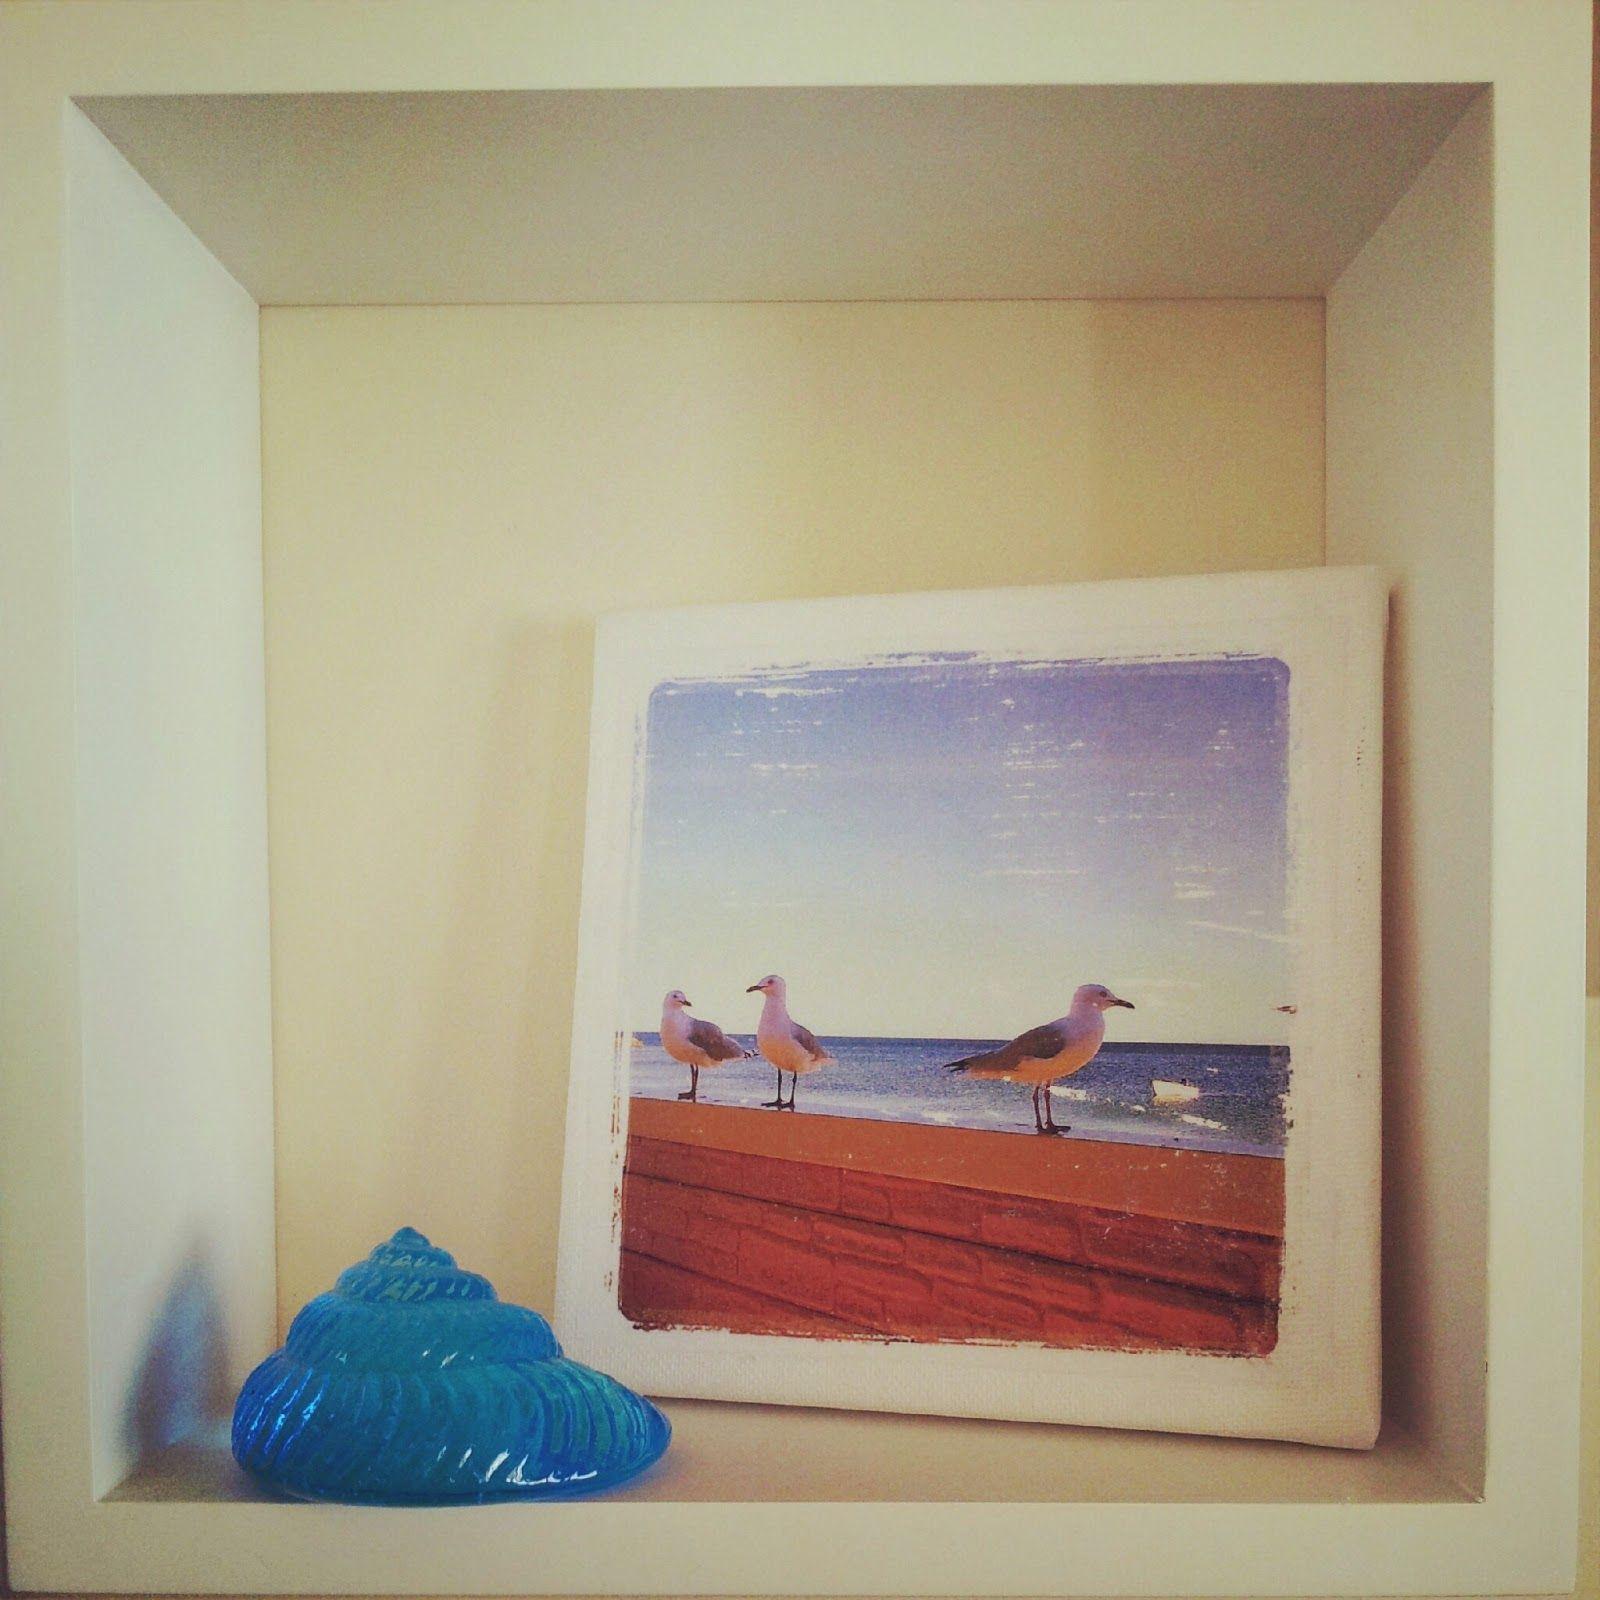 H@Home: Seagul Photo Canvas